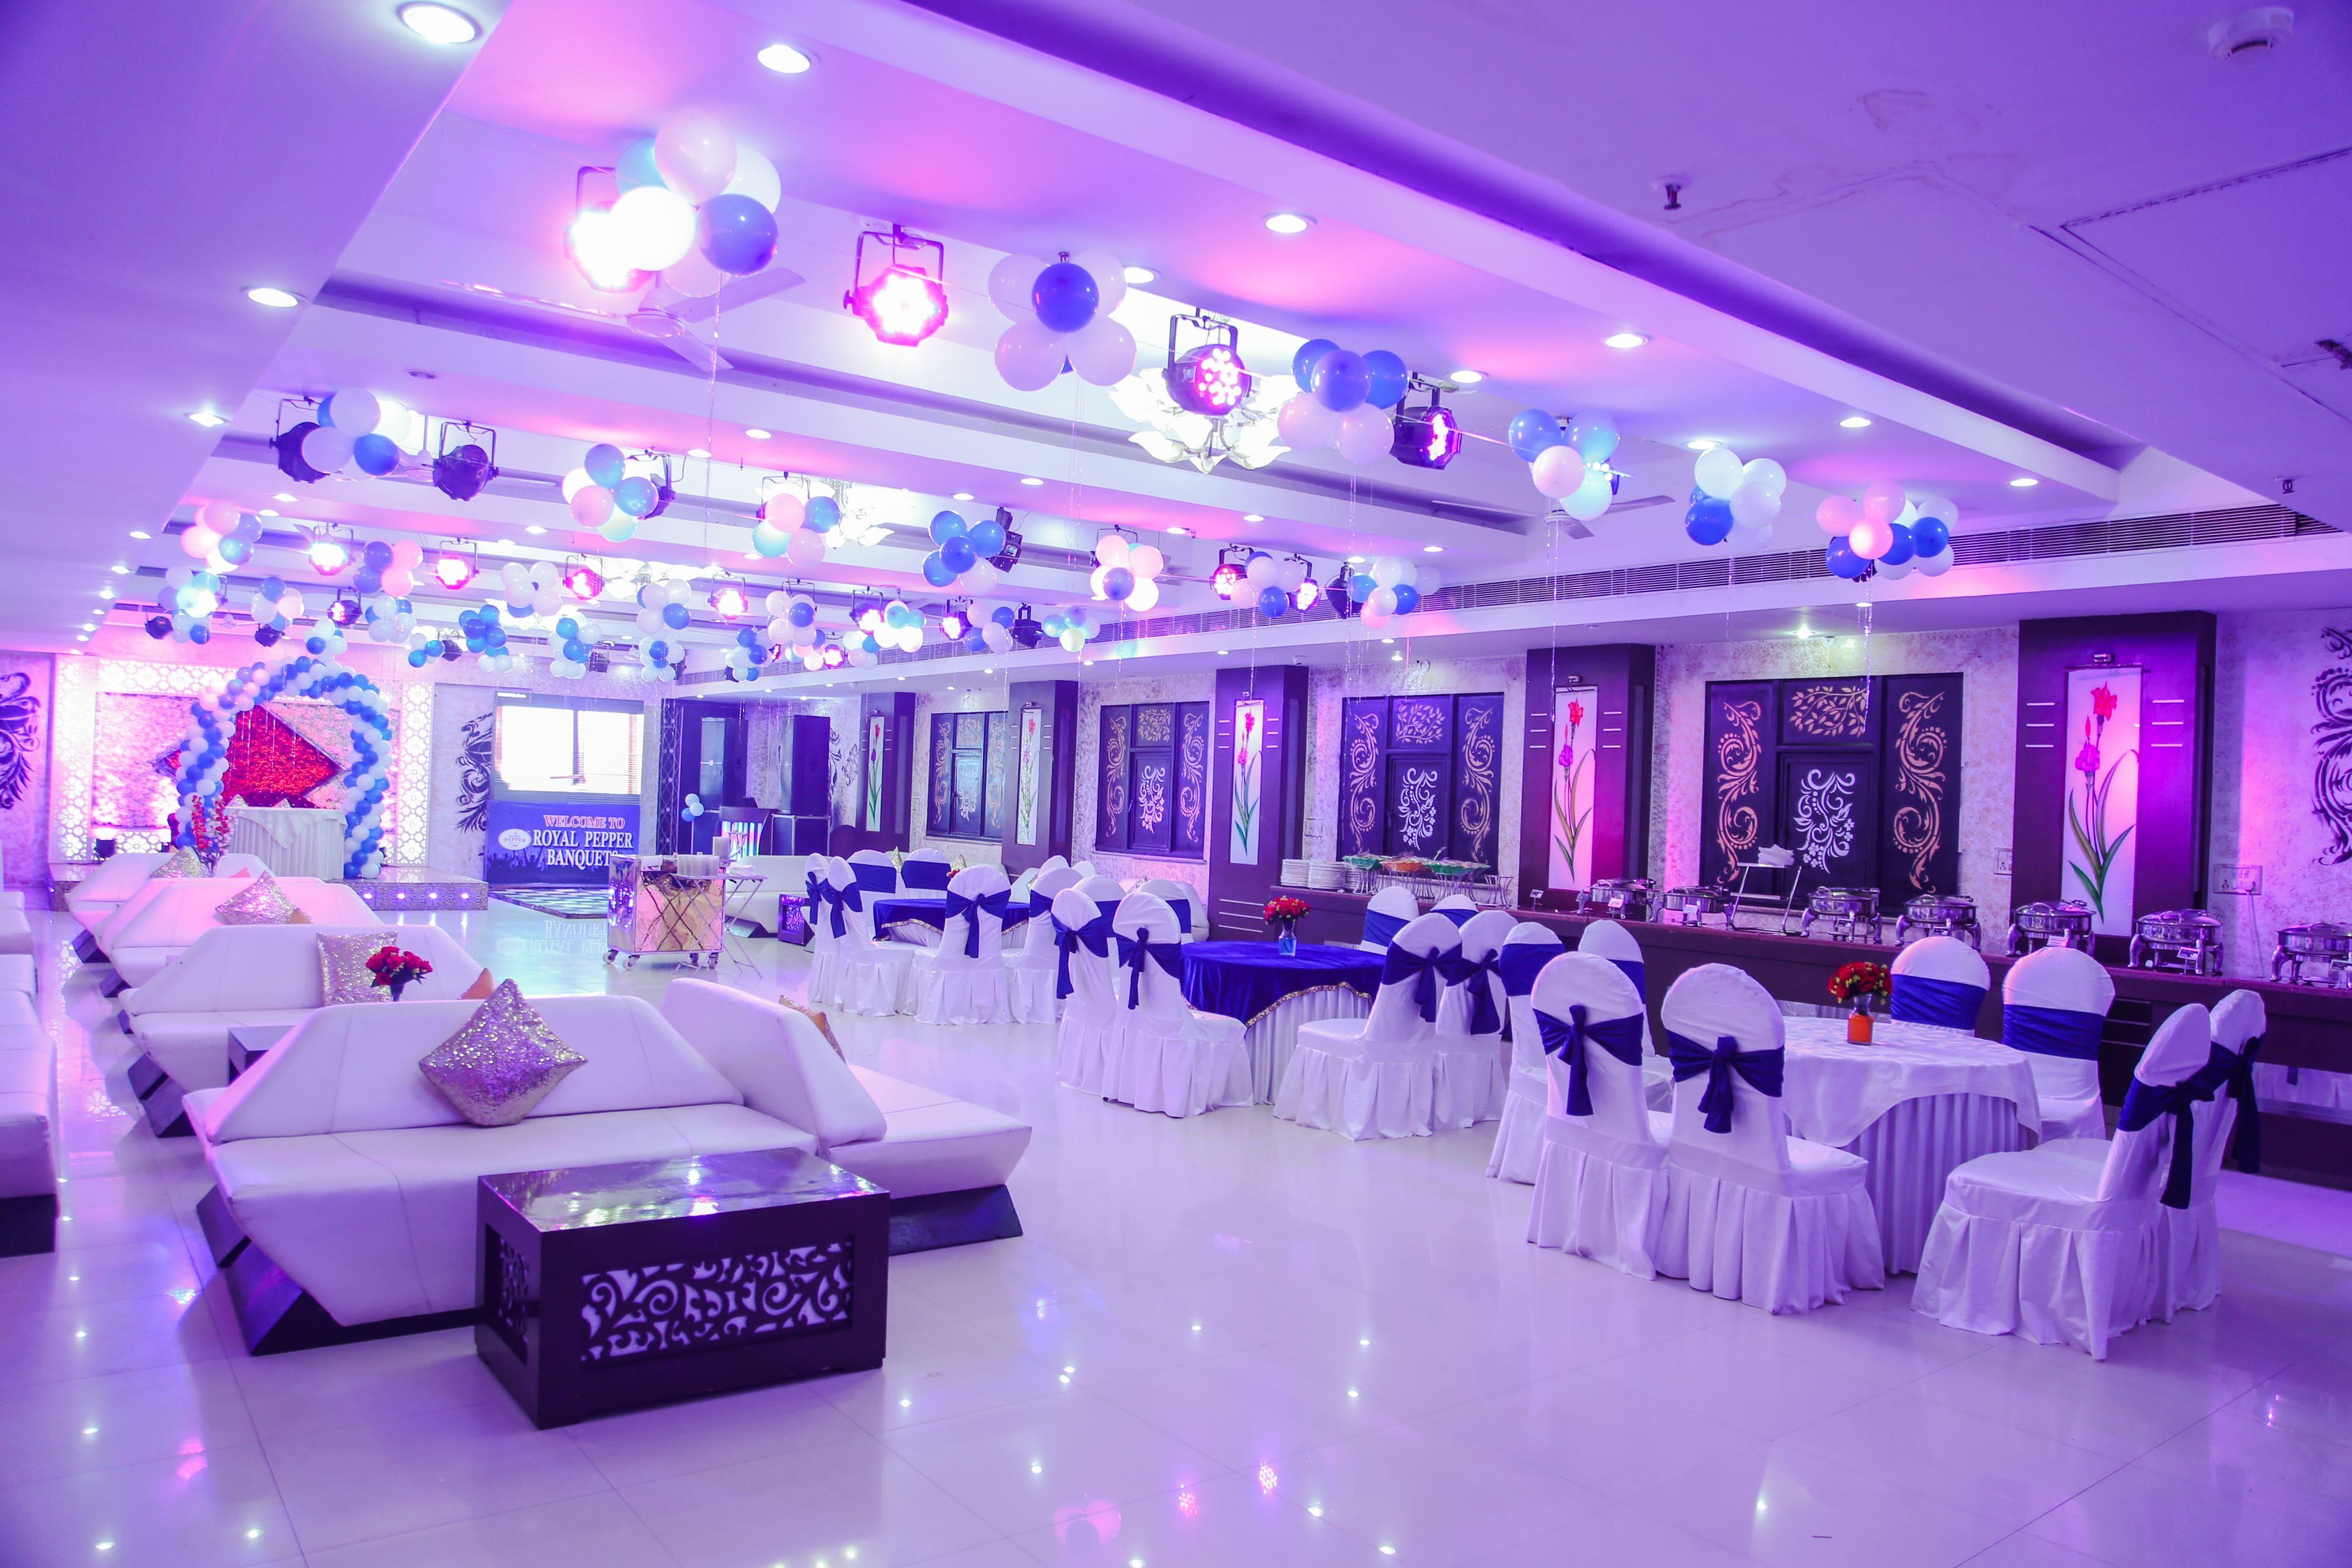 banquet-halls-in-rohini-best-banquet-halls-rohini.jpg